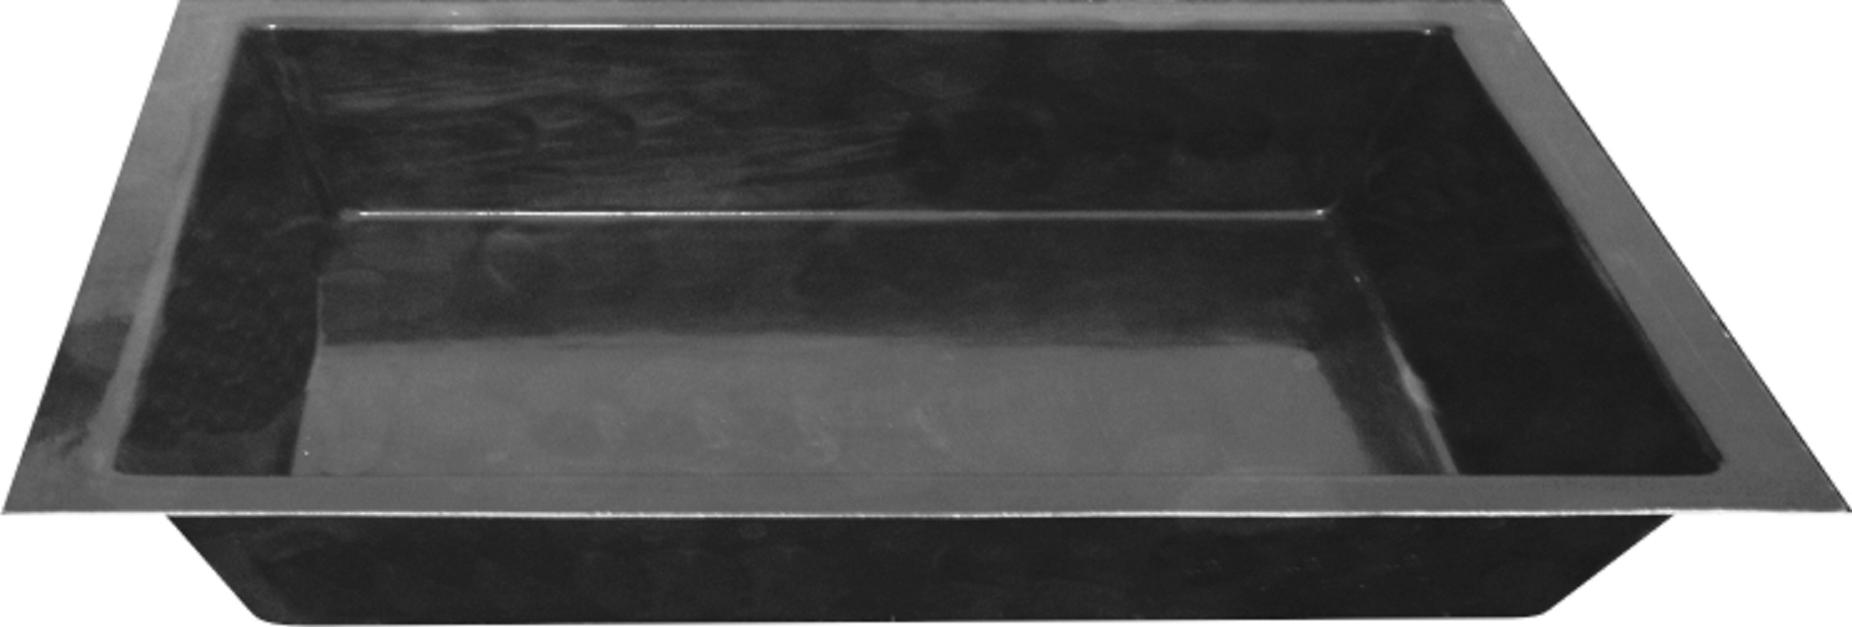 gfk teichbecken modern rechteckig 240 180 52cm 1460l 6072. Black Bedroom Furniture Sets. Home Design Ideas